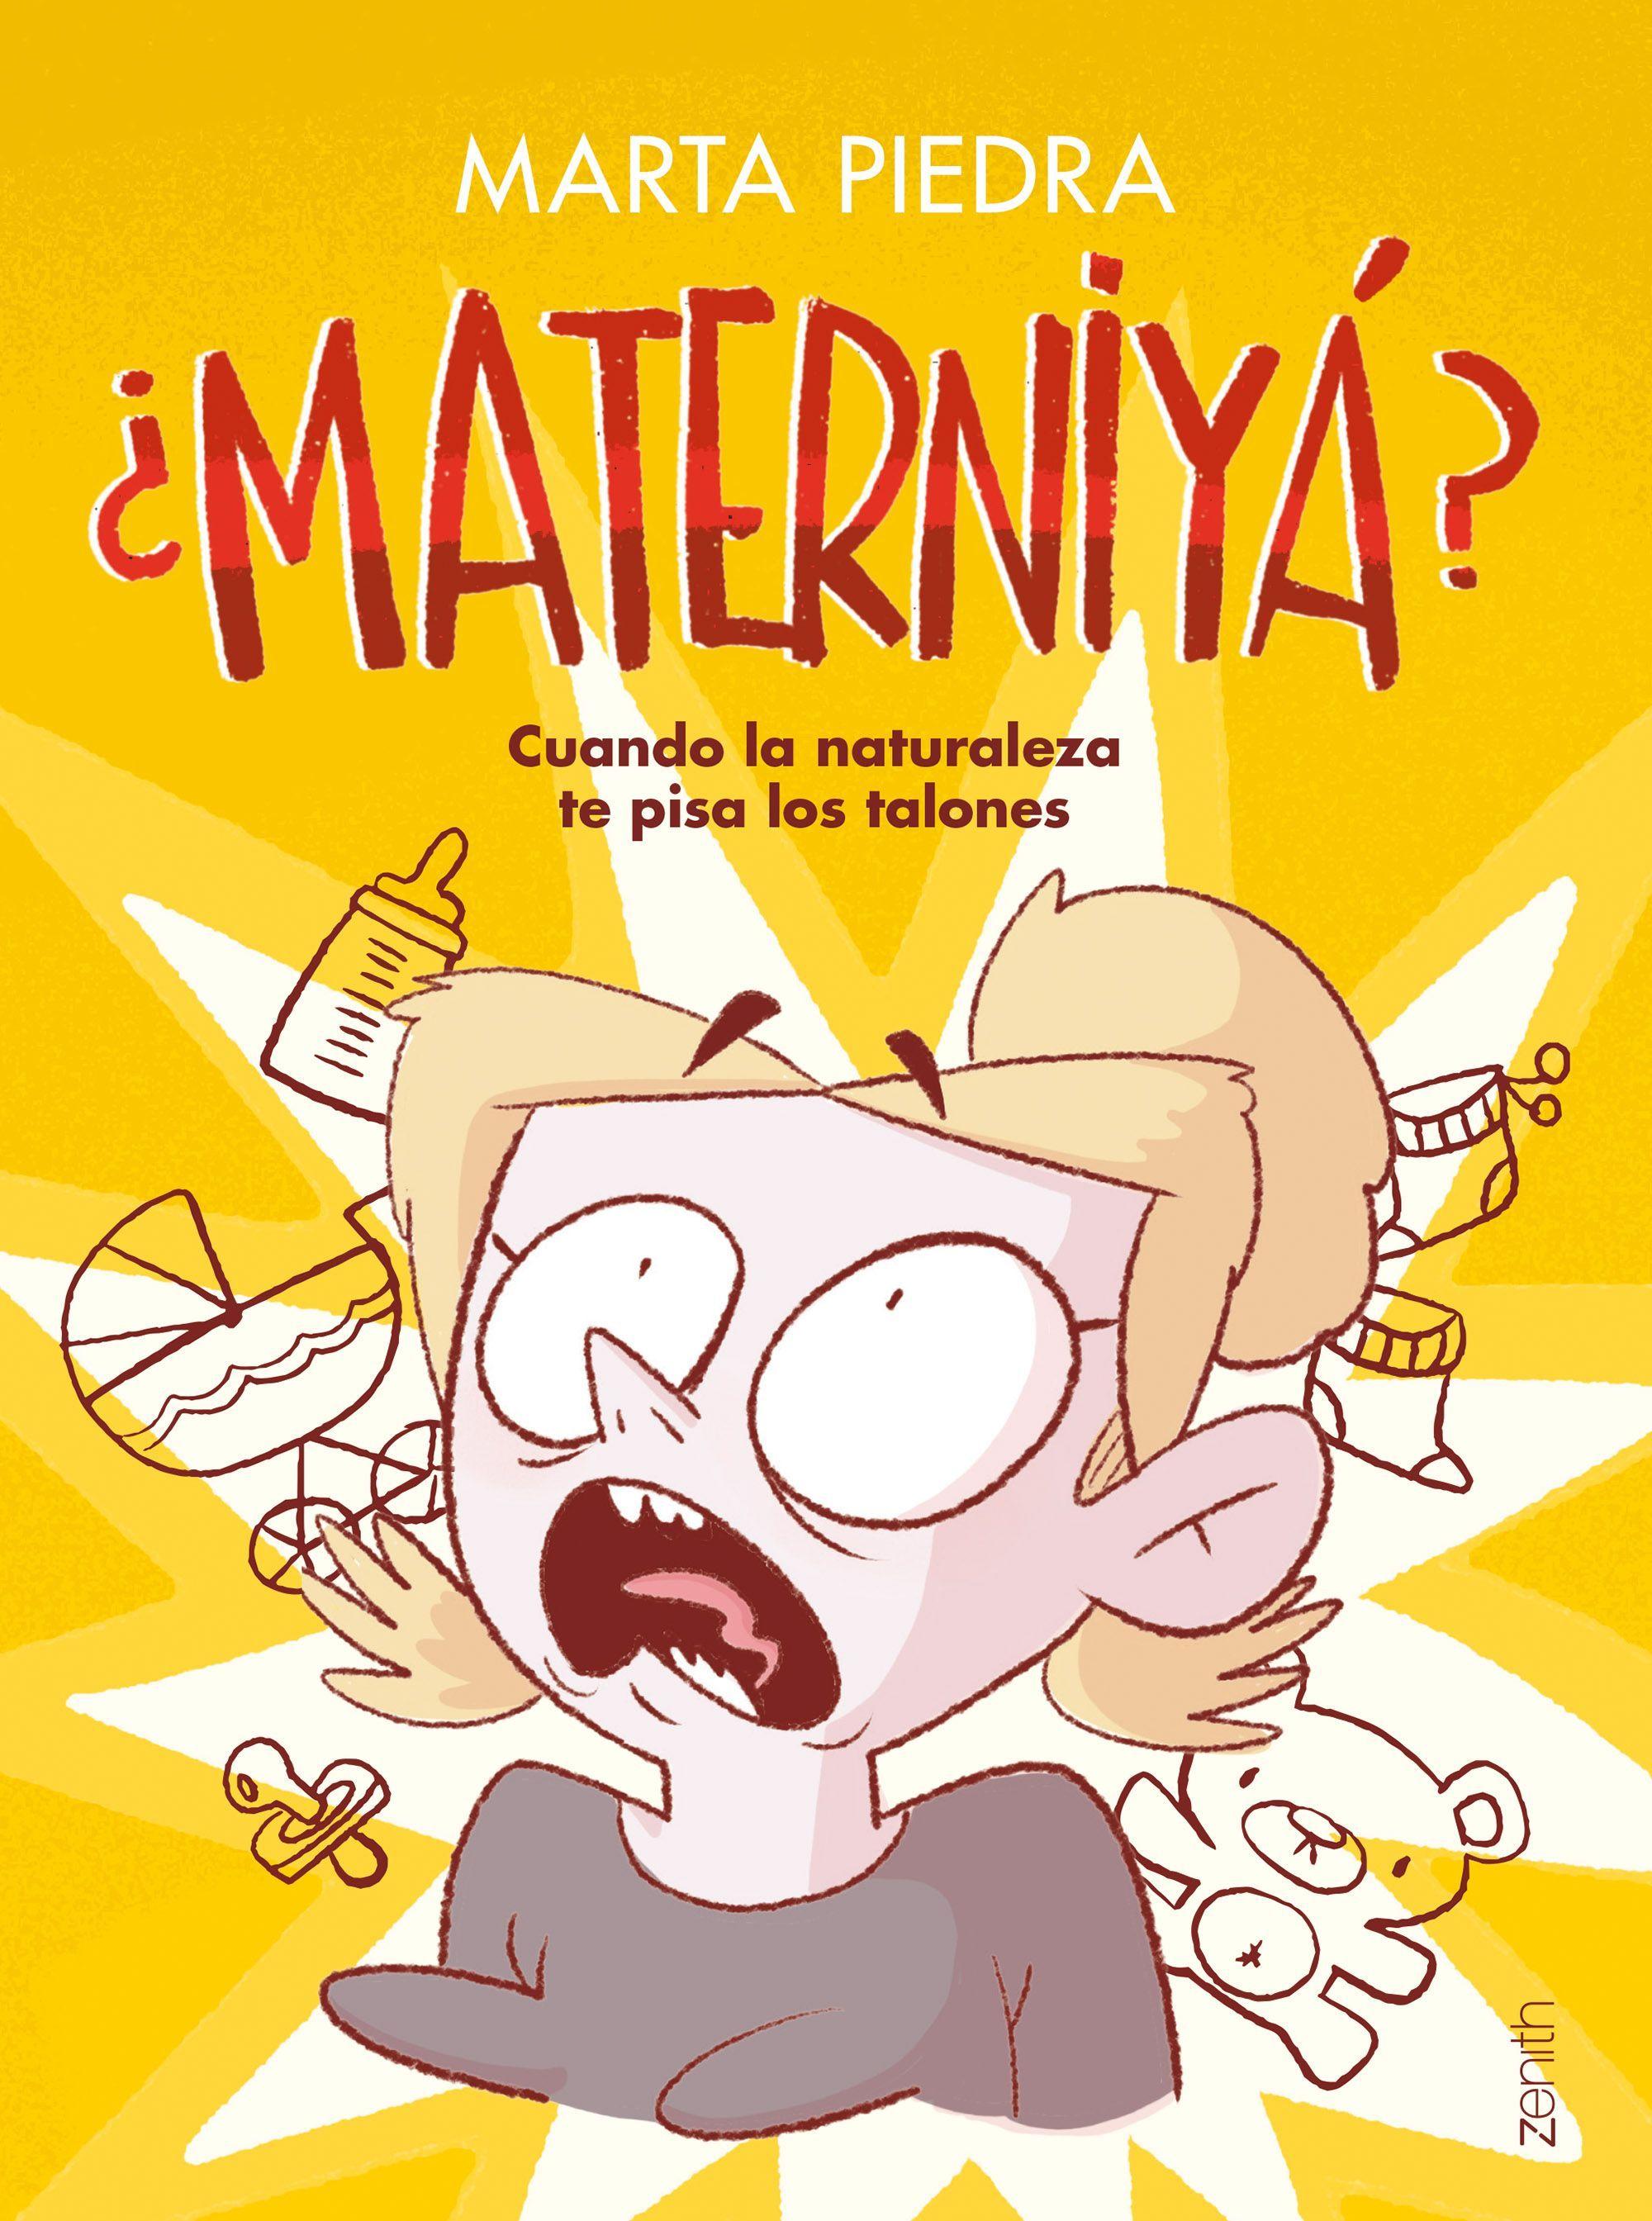 MATERNIYA?